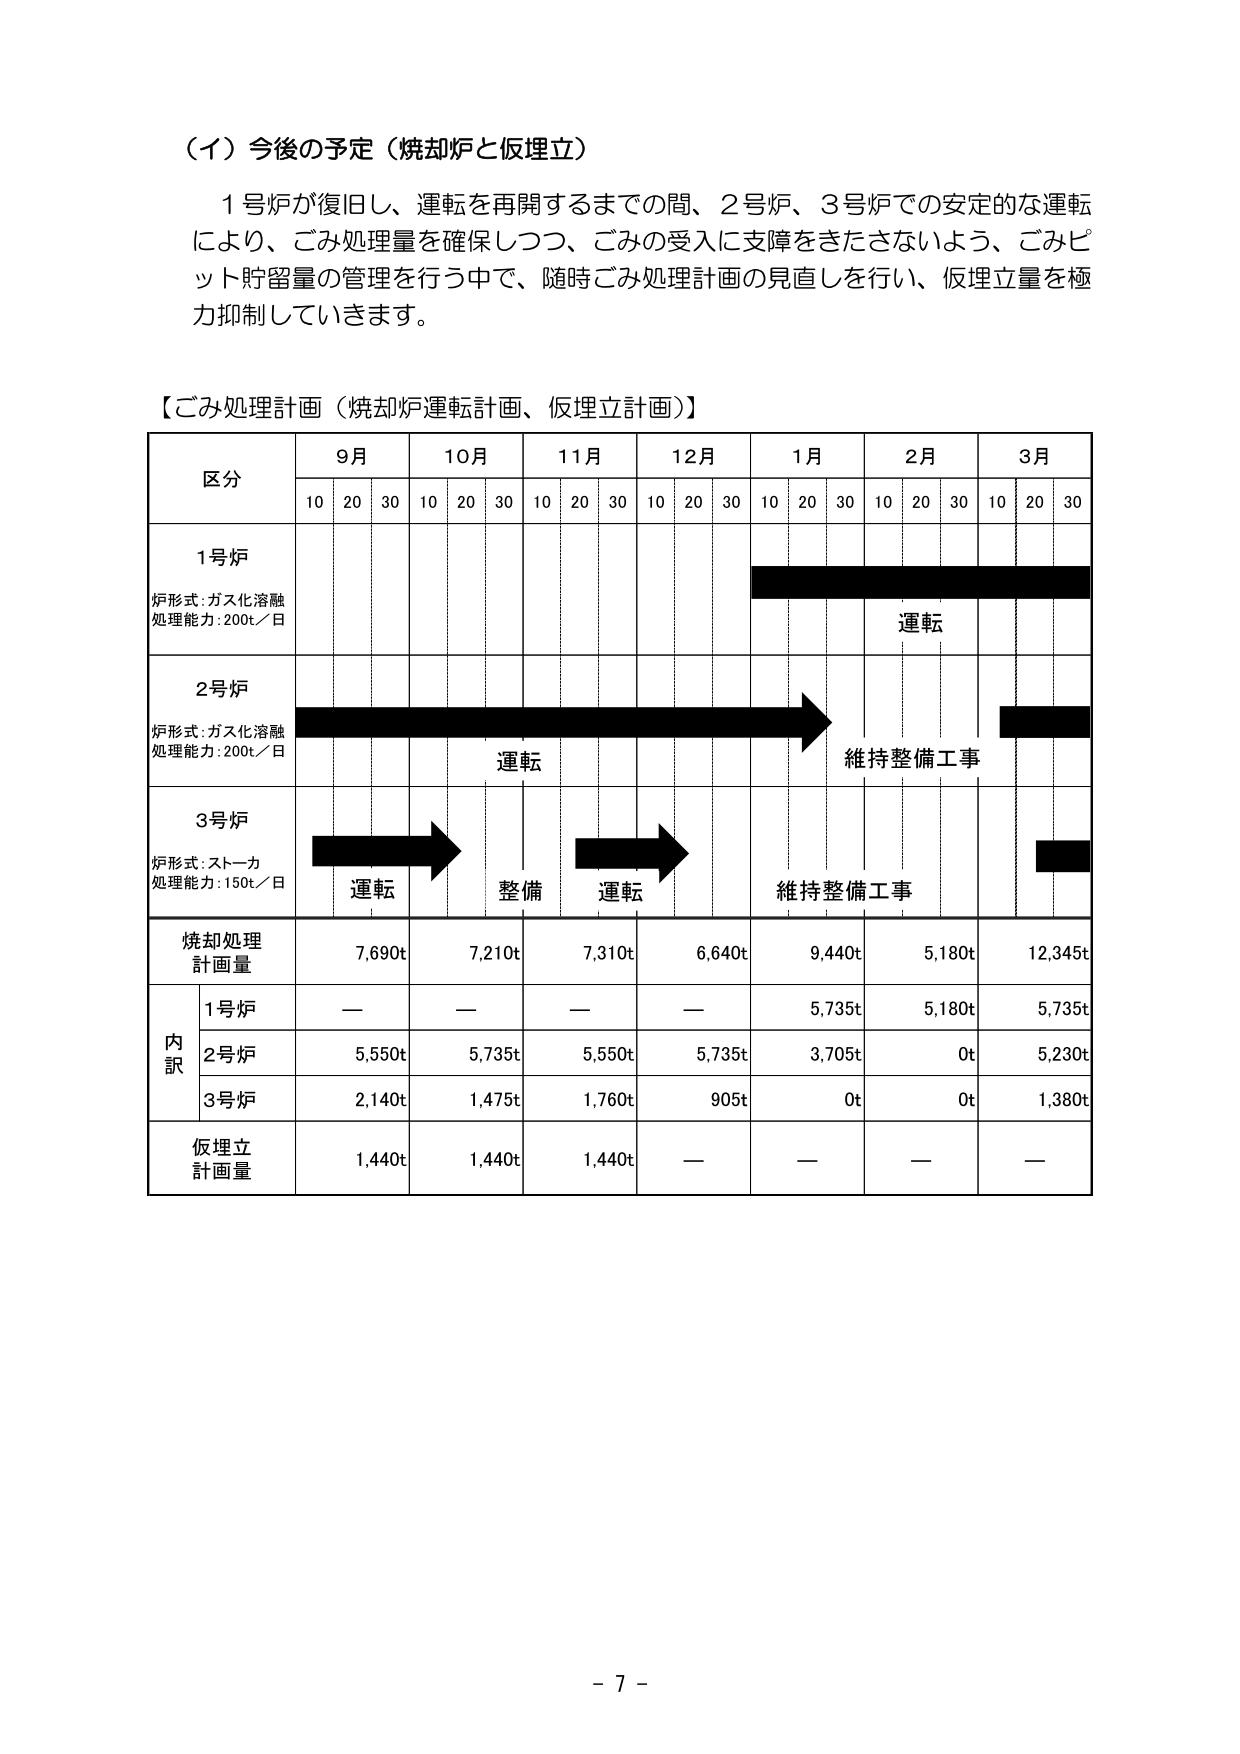 181113_181005kankyokeizai_10